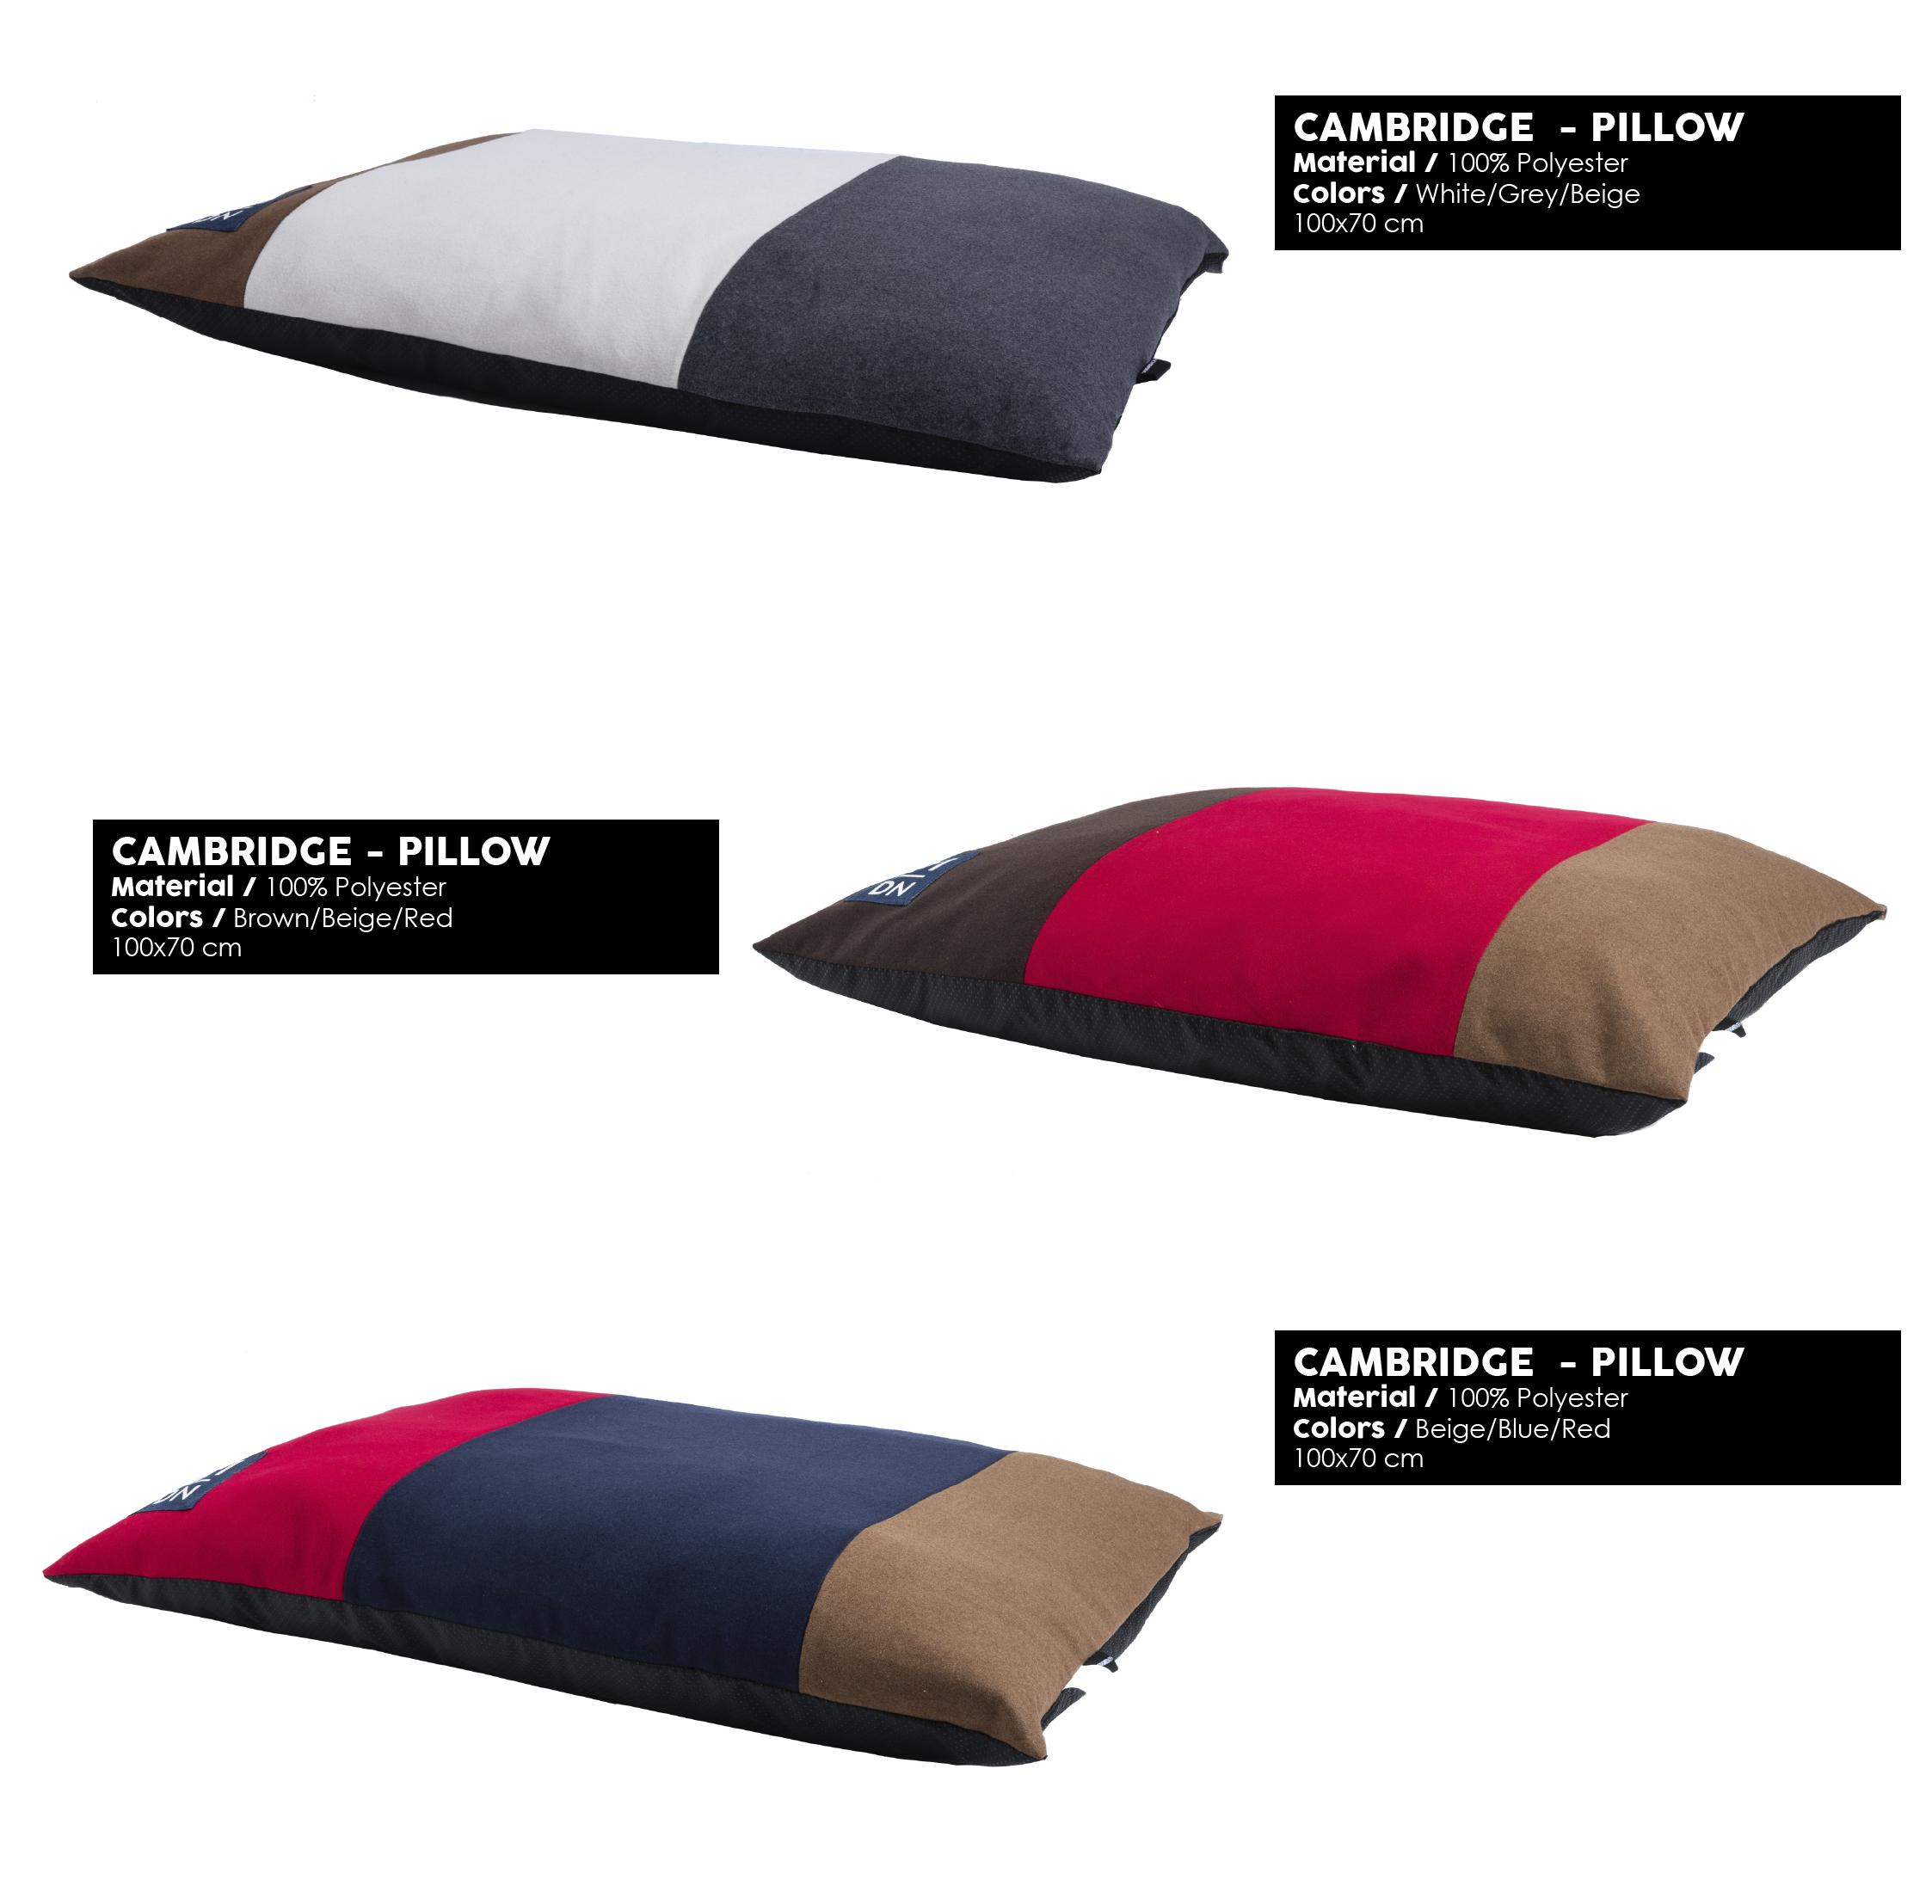 51 Degrees North - CAMBRIDGE - Pillow